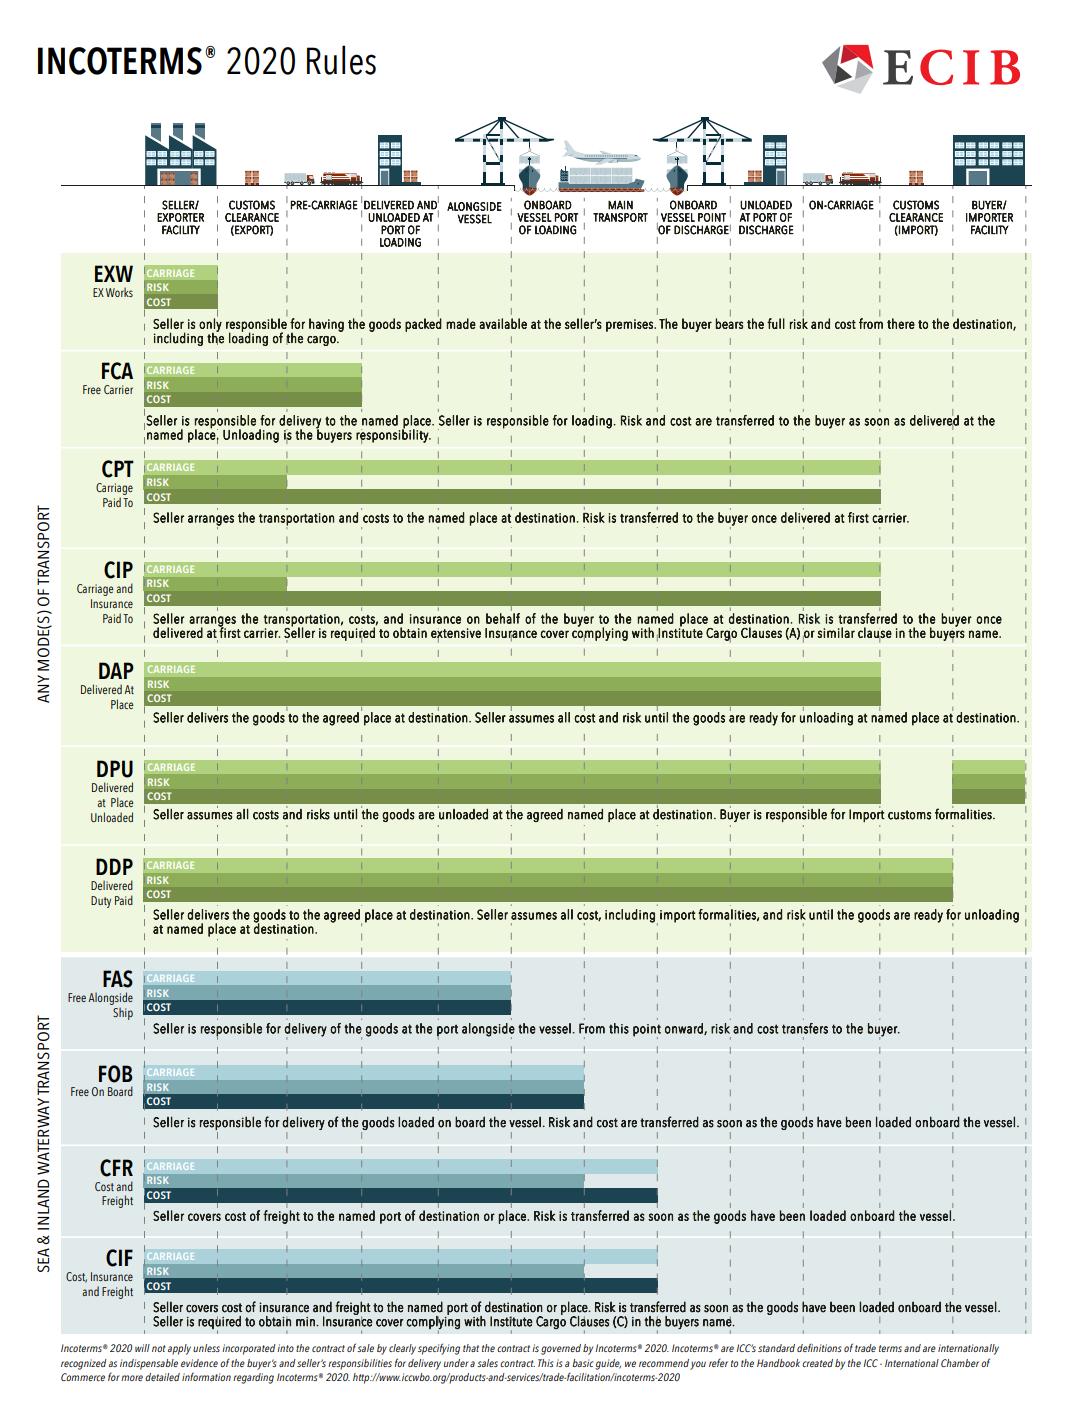 ECIB Incoterms® 2020 Chart Download